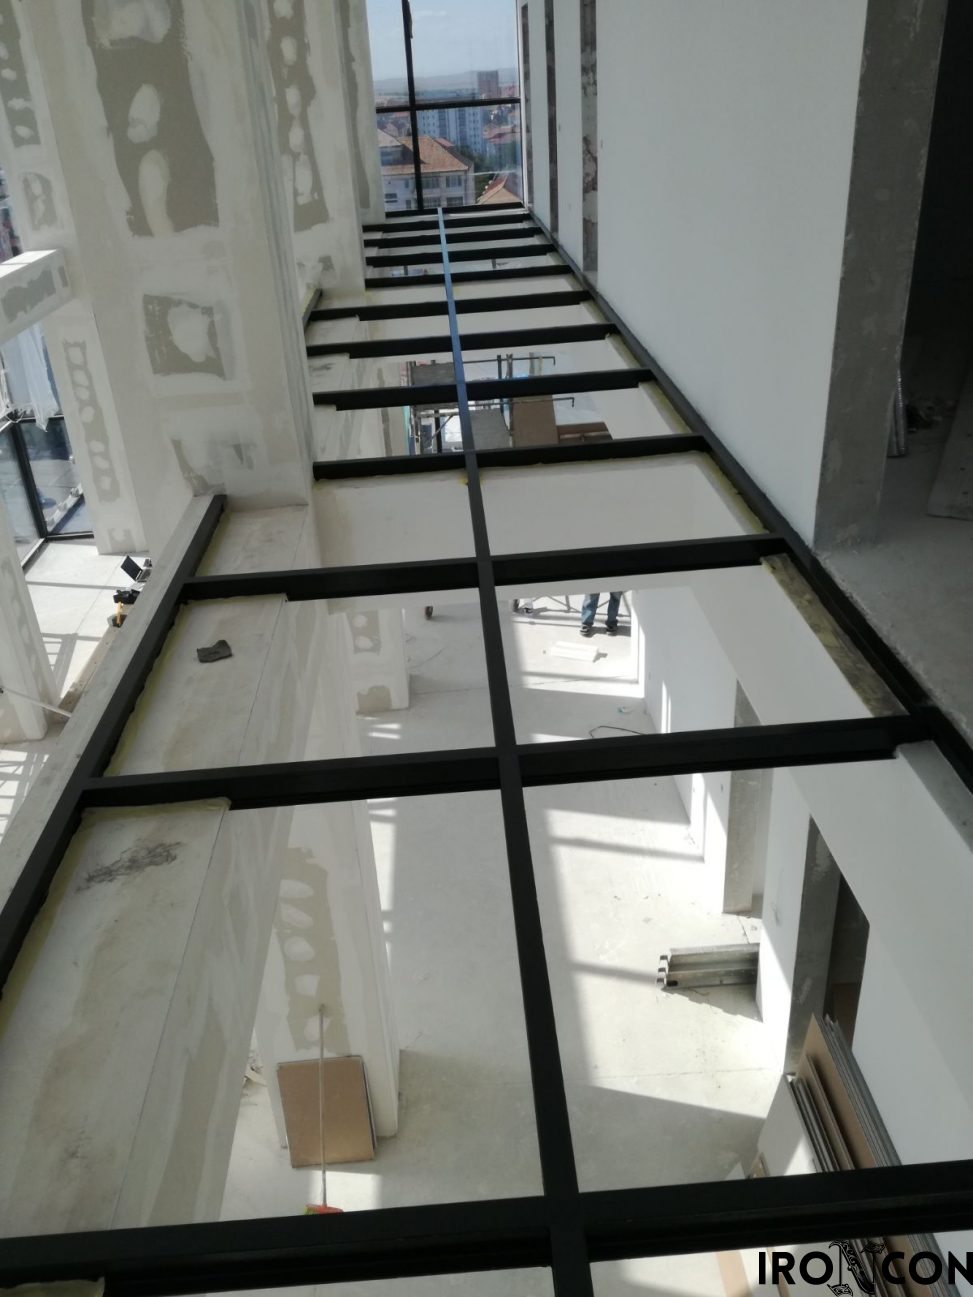 structura metalica balustrada sticla 10048-1